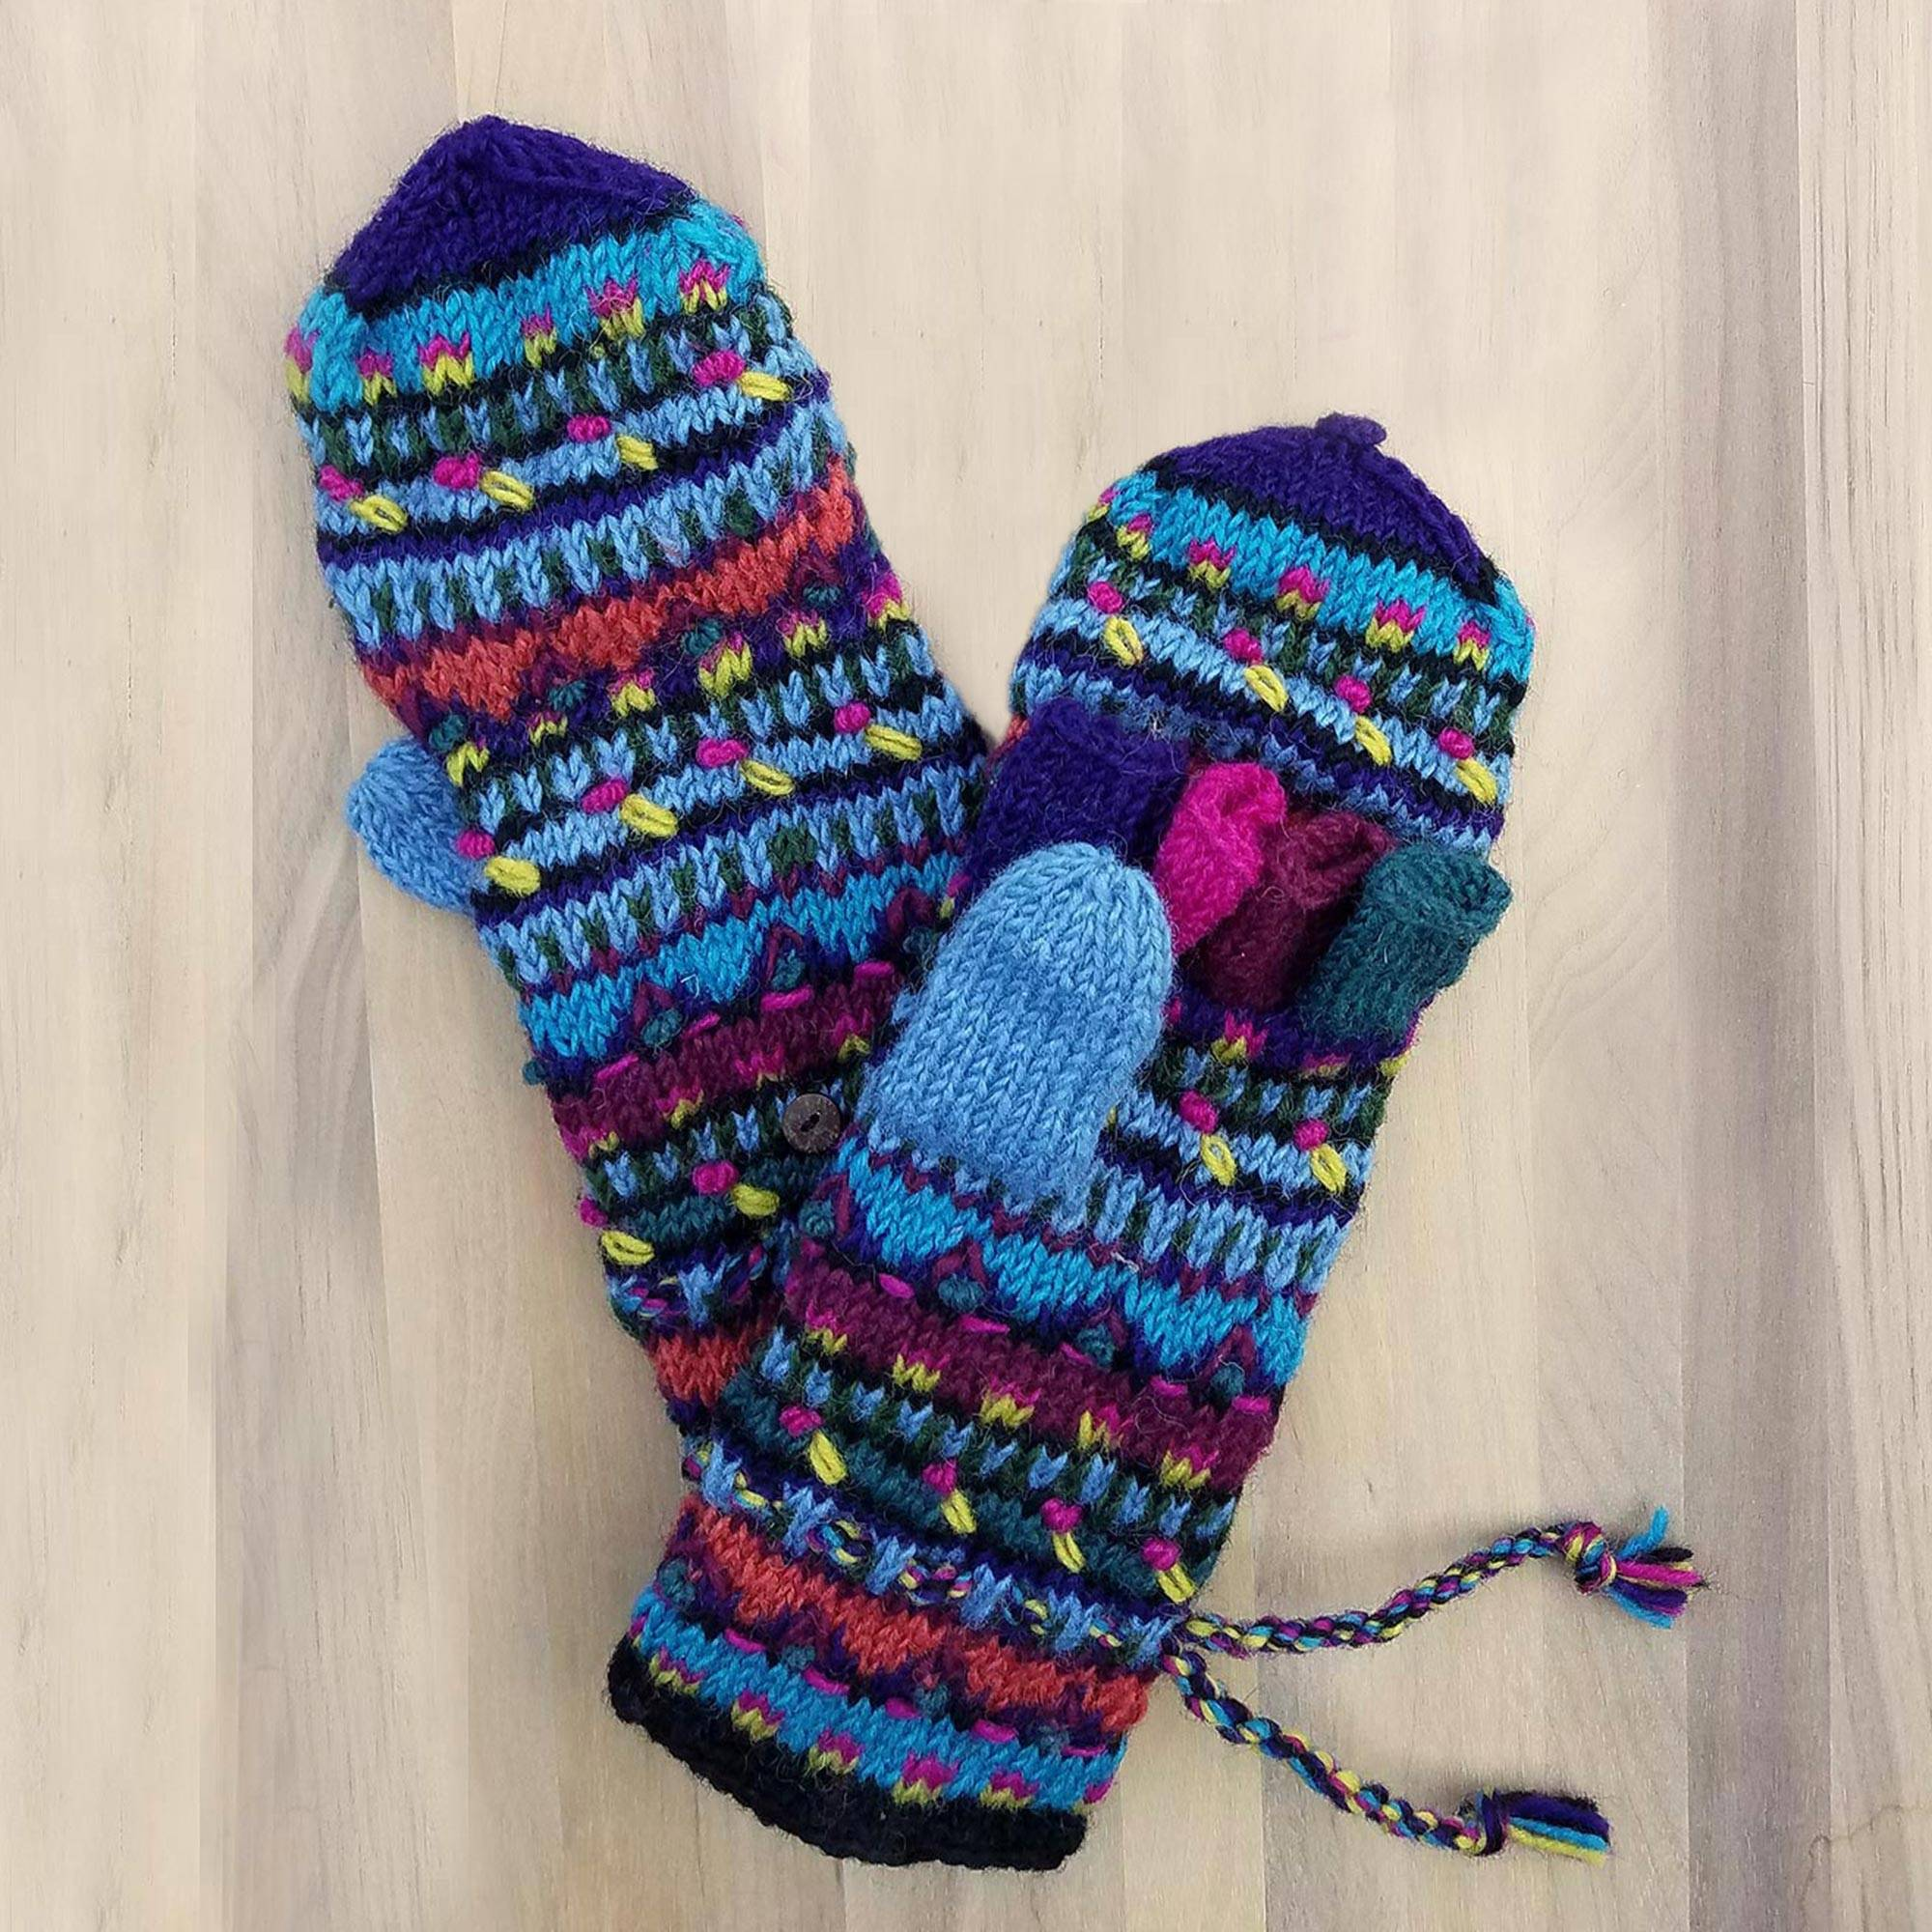 New Fair Trade Soft Merino Wool Hand Made Warm Winter Gloves From Nepal